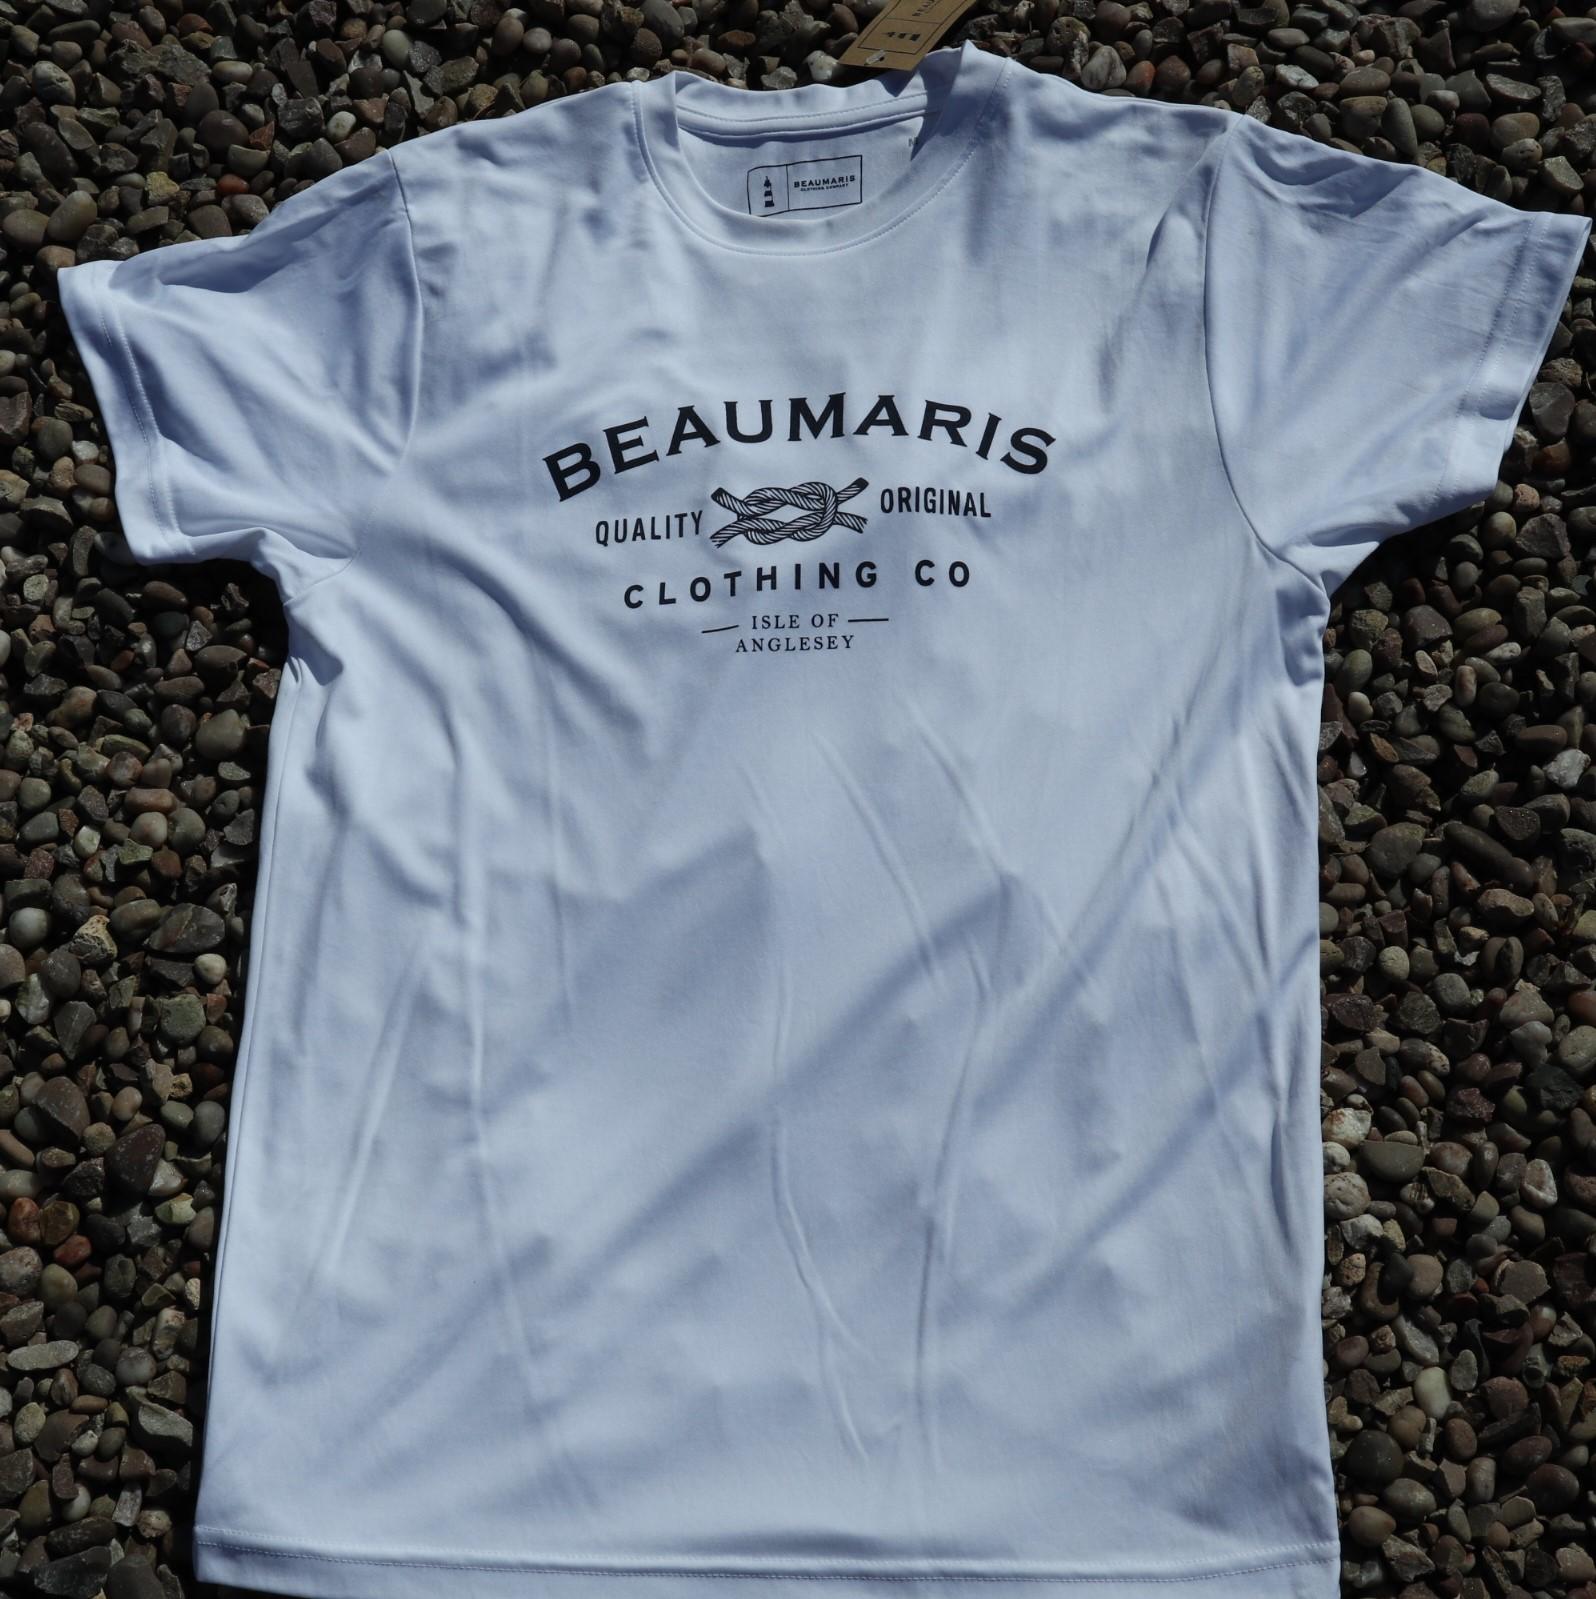 Beaumaris clothing company logo tee white